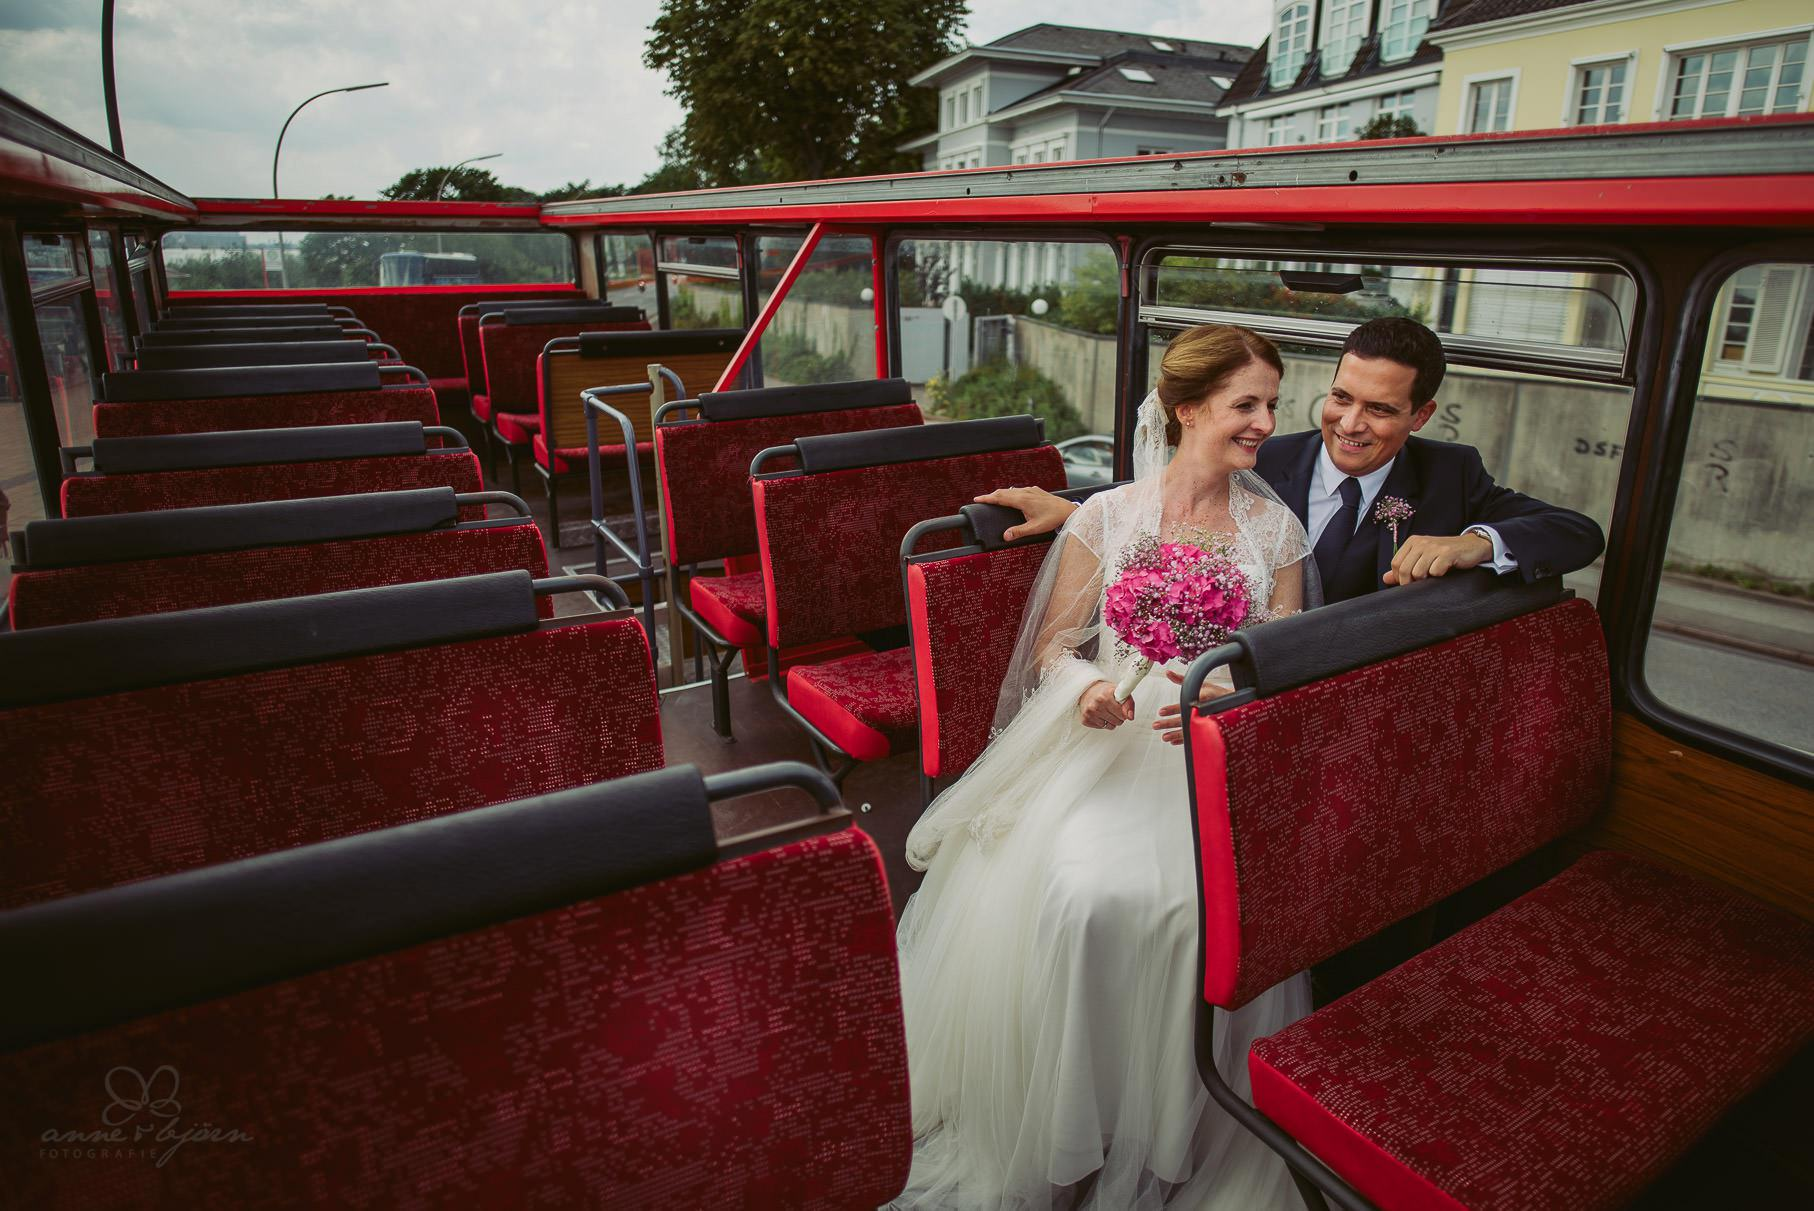 0049 aud blog 811 0374 - Hochzeit an der Hamburger Elbe - Ann-Katrin & Daniel